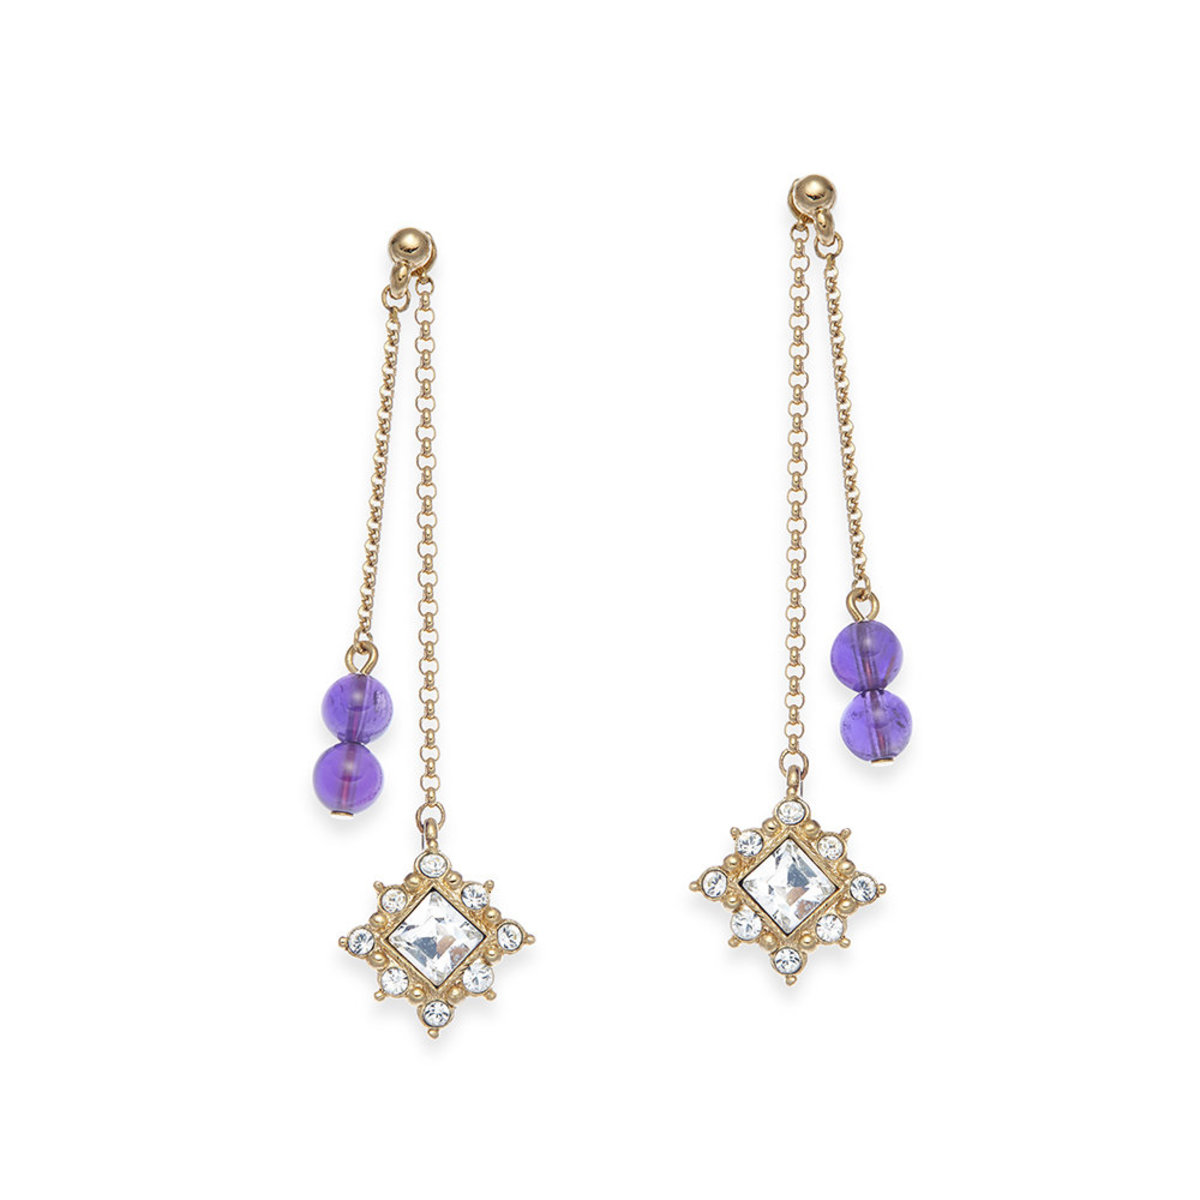 Charisma: gold plating, semi-precious stone bead,   Swarovski crystal 2-way pierced earrings